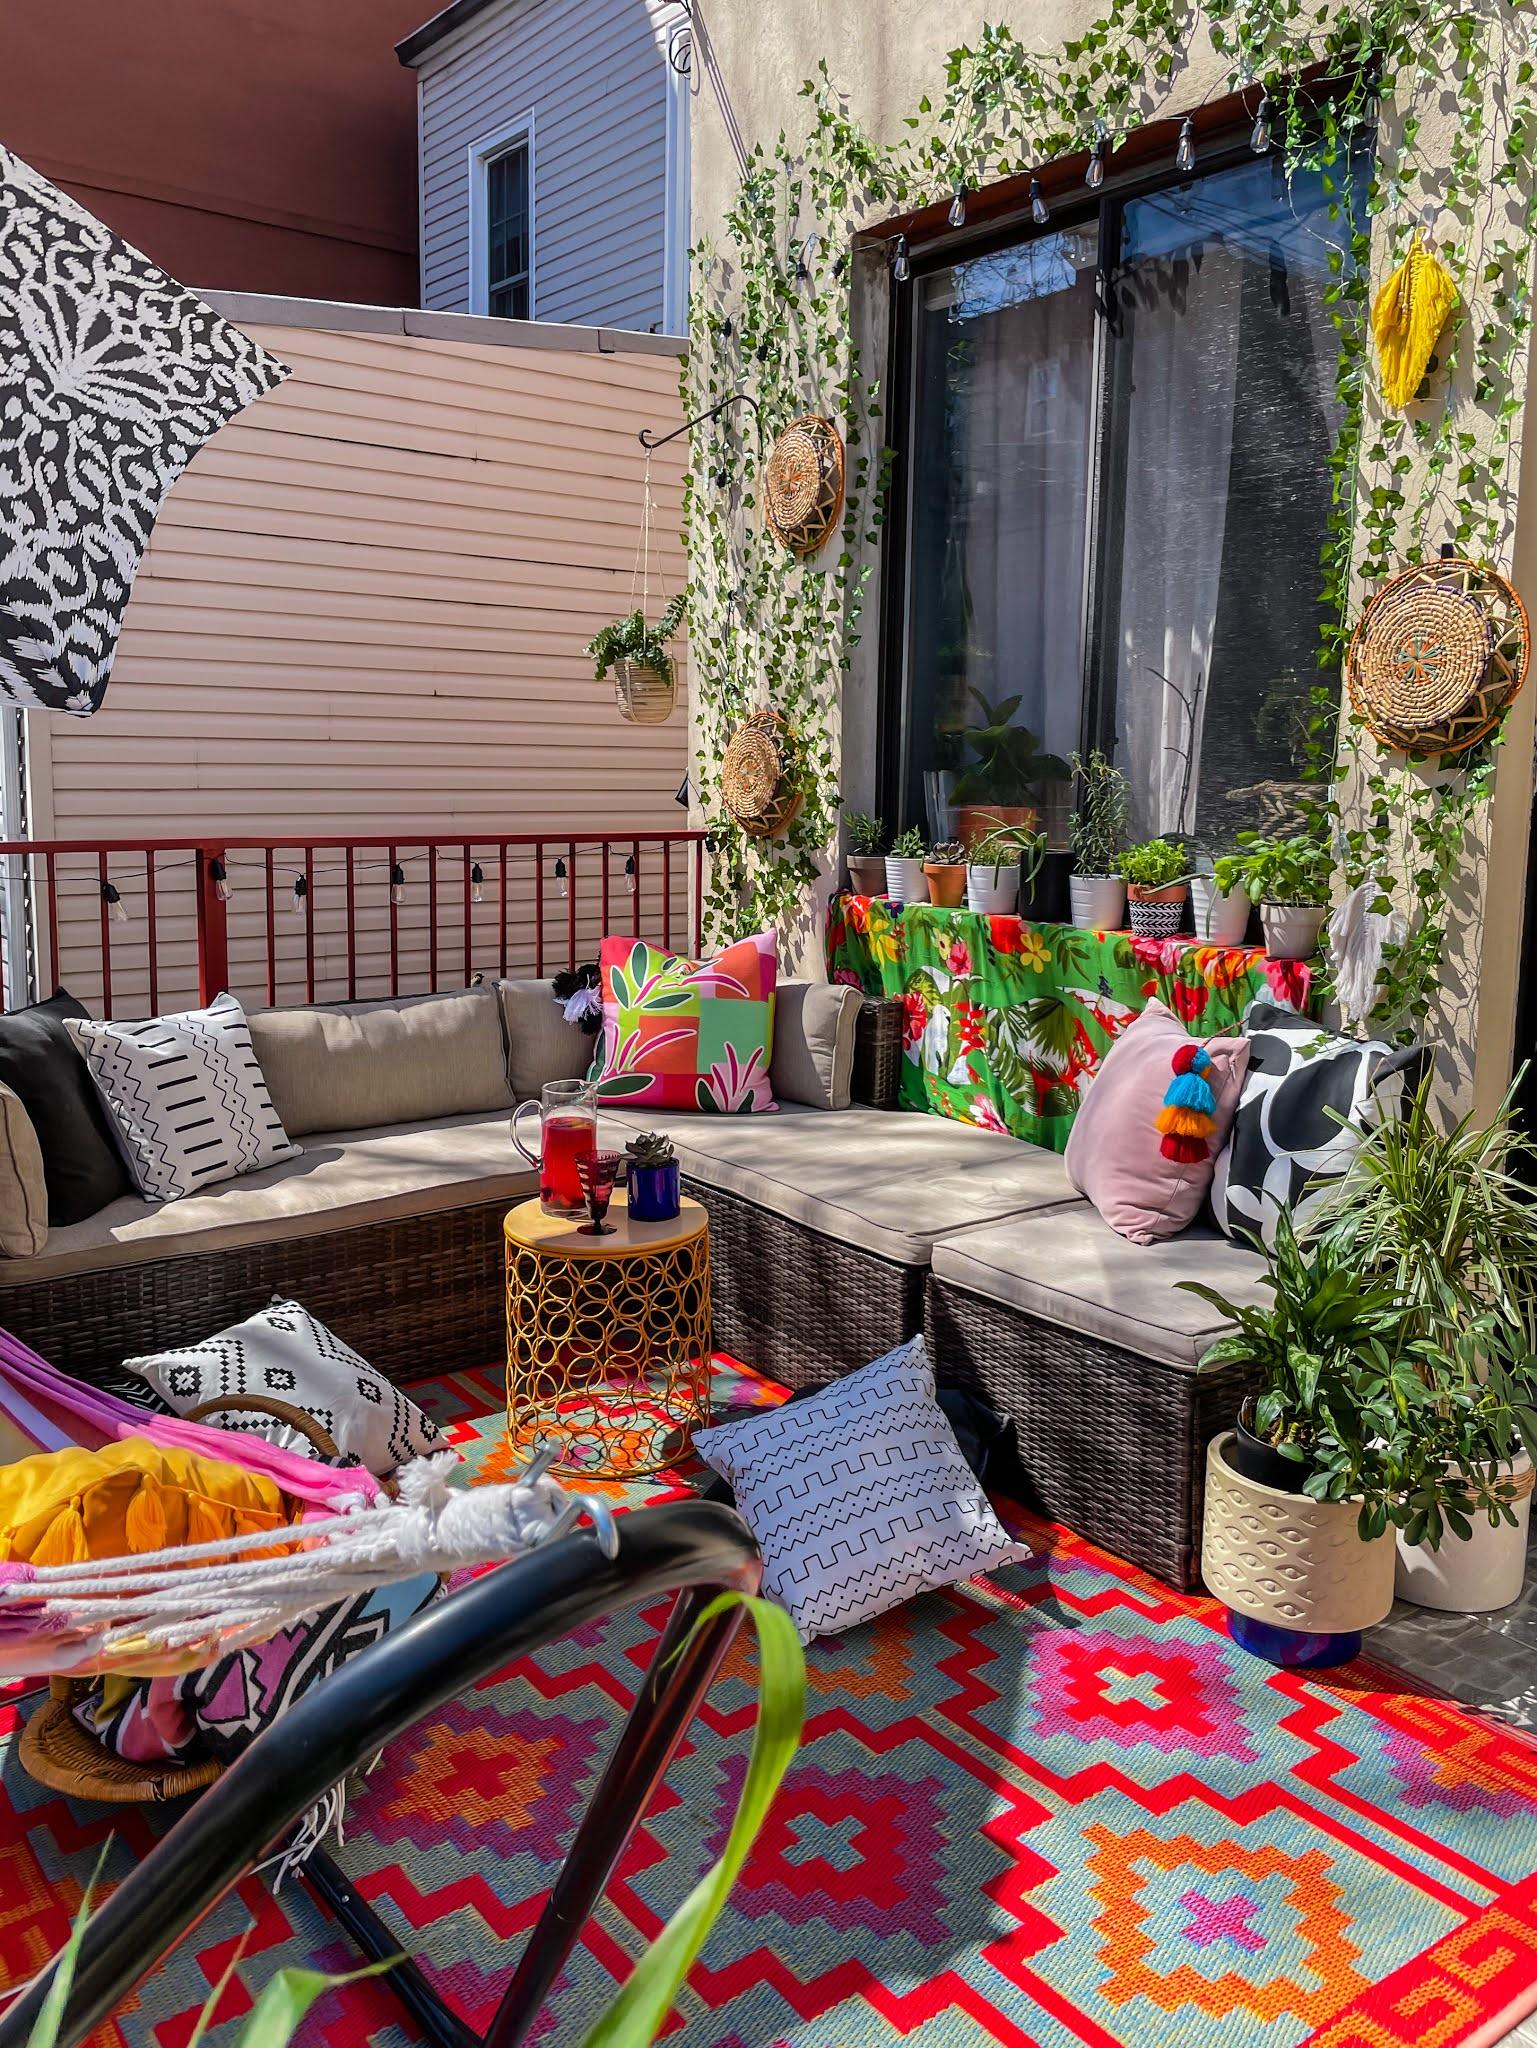 Renter-Friendly Patio Decor,  patio decor, faux ivy wall, command outdoor light clips, patio decor ideas, faux ivy wall diy, small space patio decor, small patio design ideas, boho outdoor decor, colorful outdoor spaces